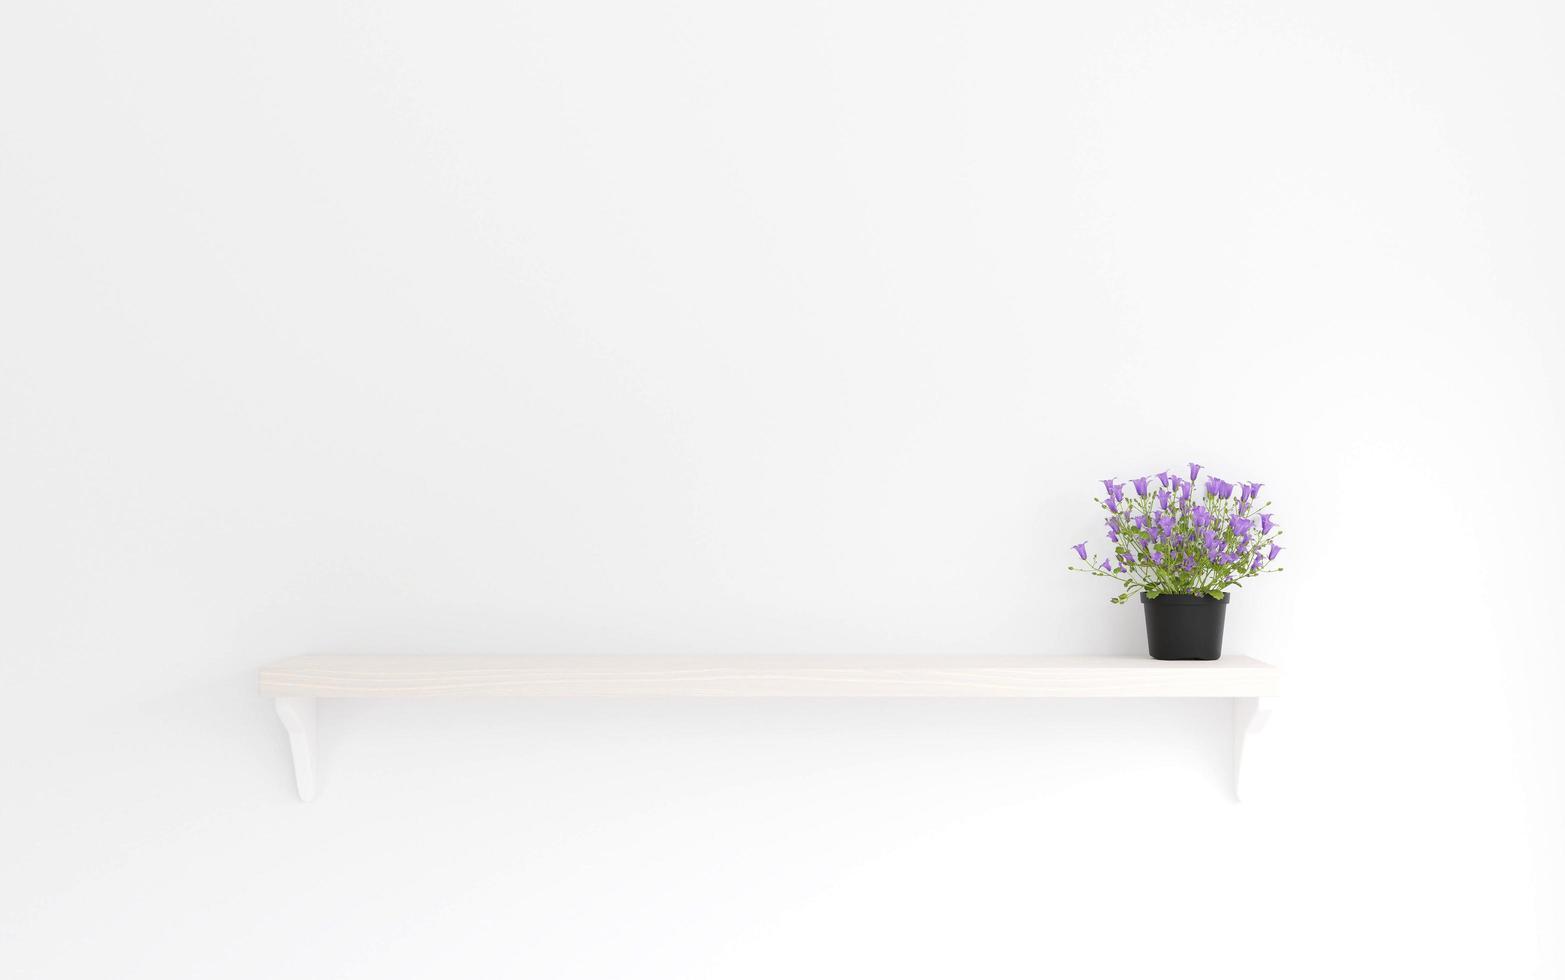 Minimal style purple flower on the wooden shelf photo